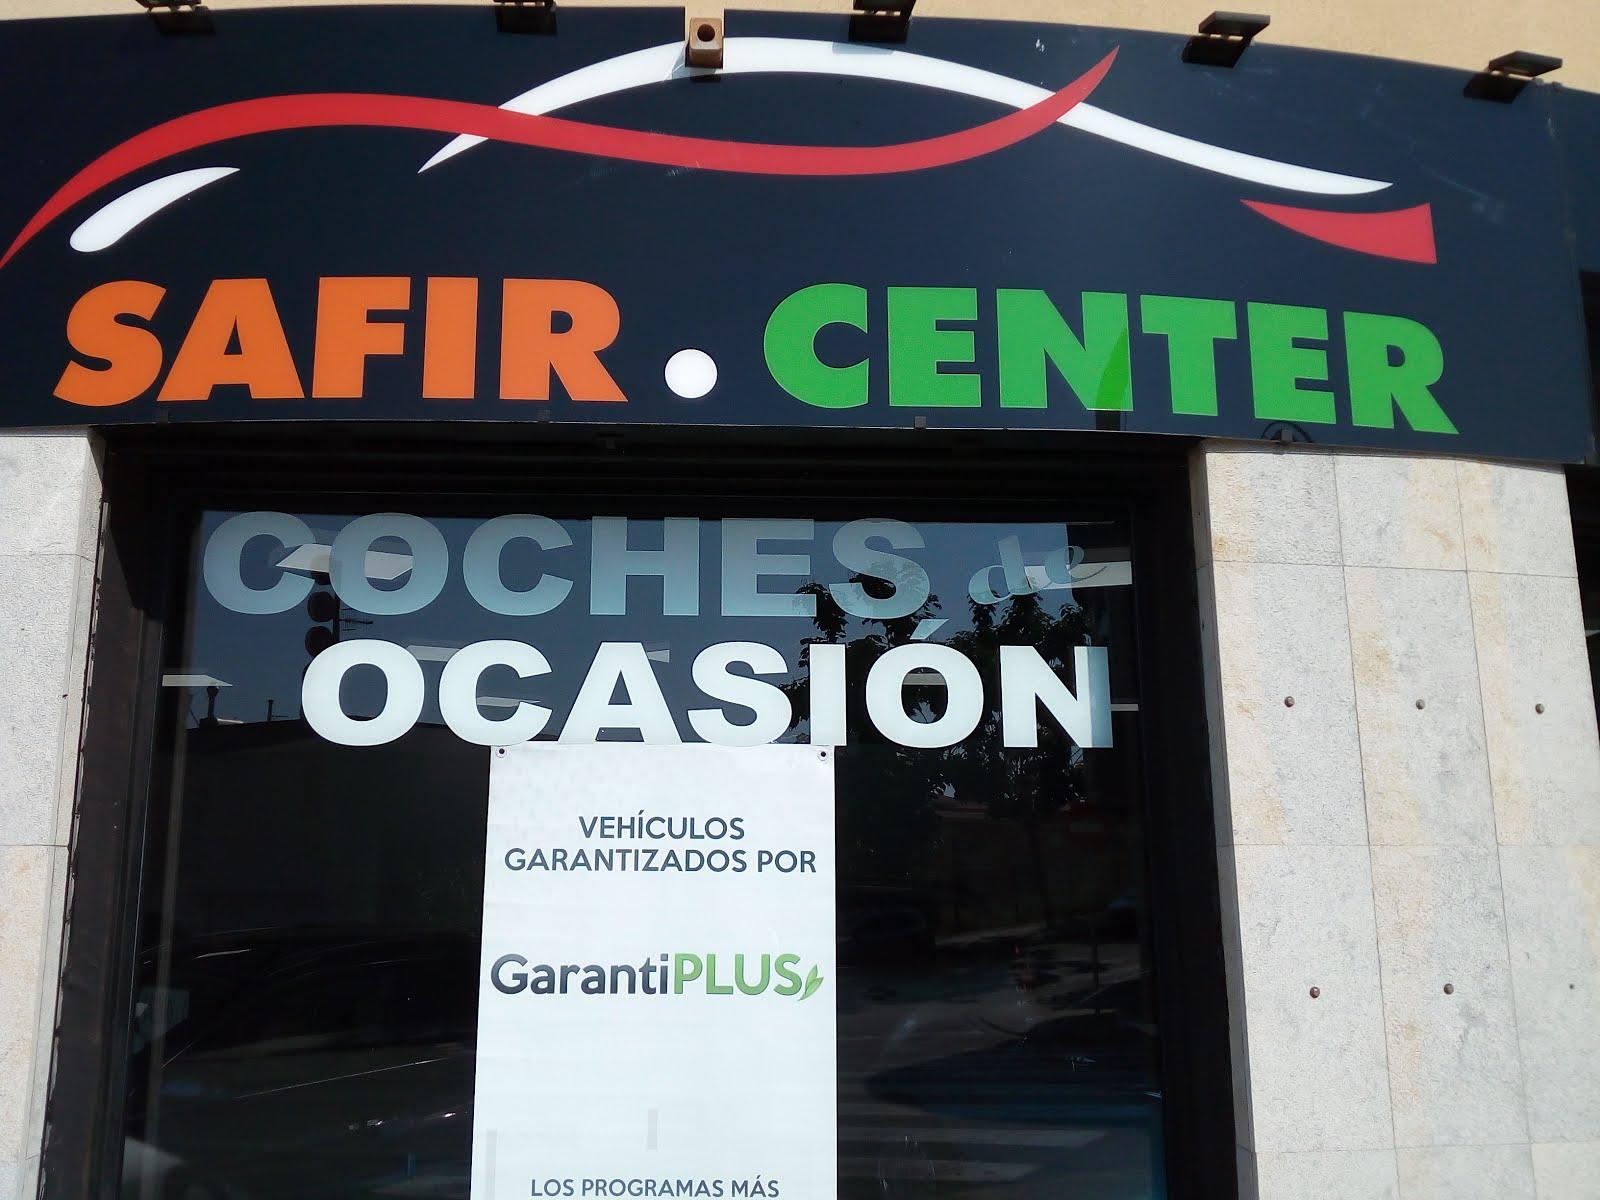 Safir Center Blanes